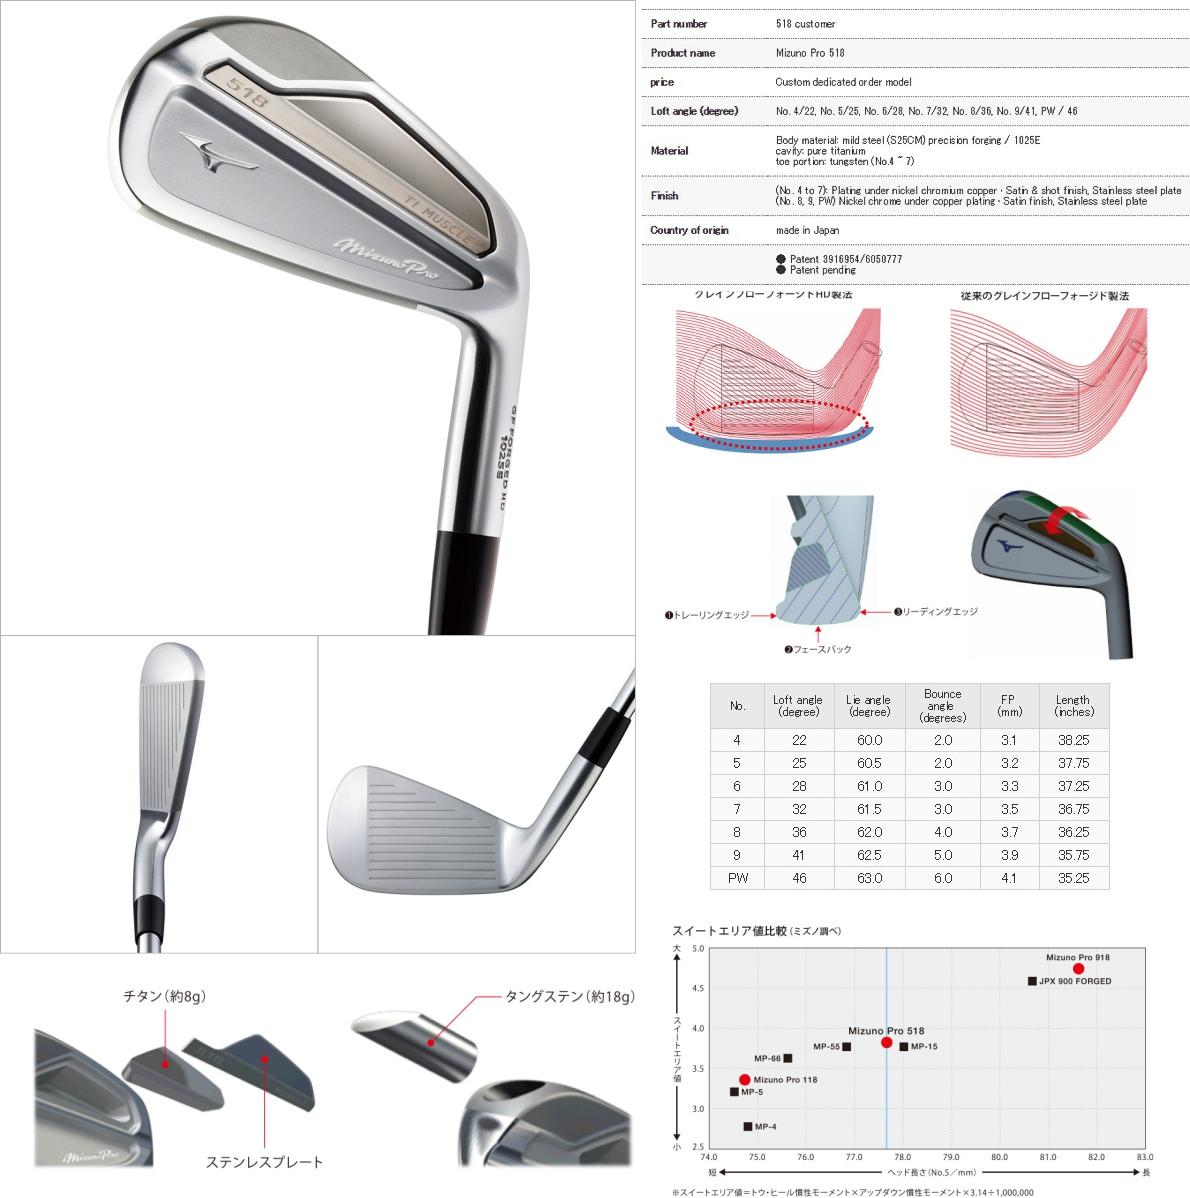 Mizuno Pro 518 Irons